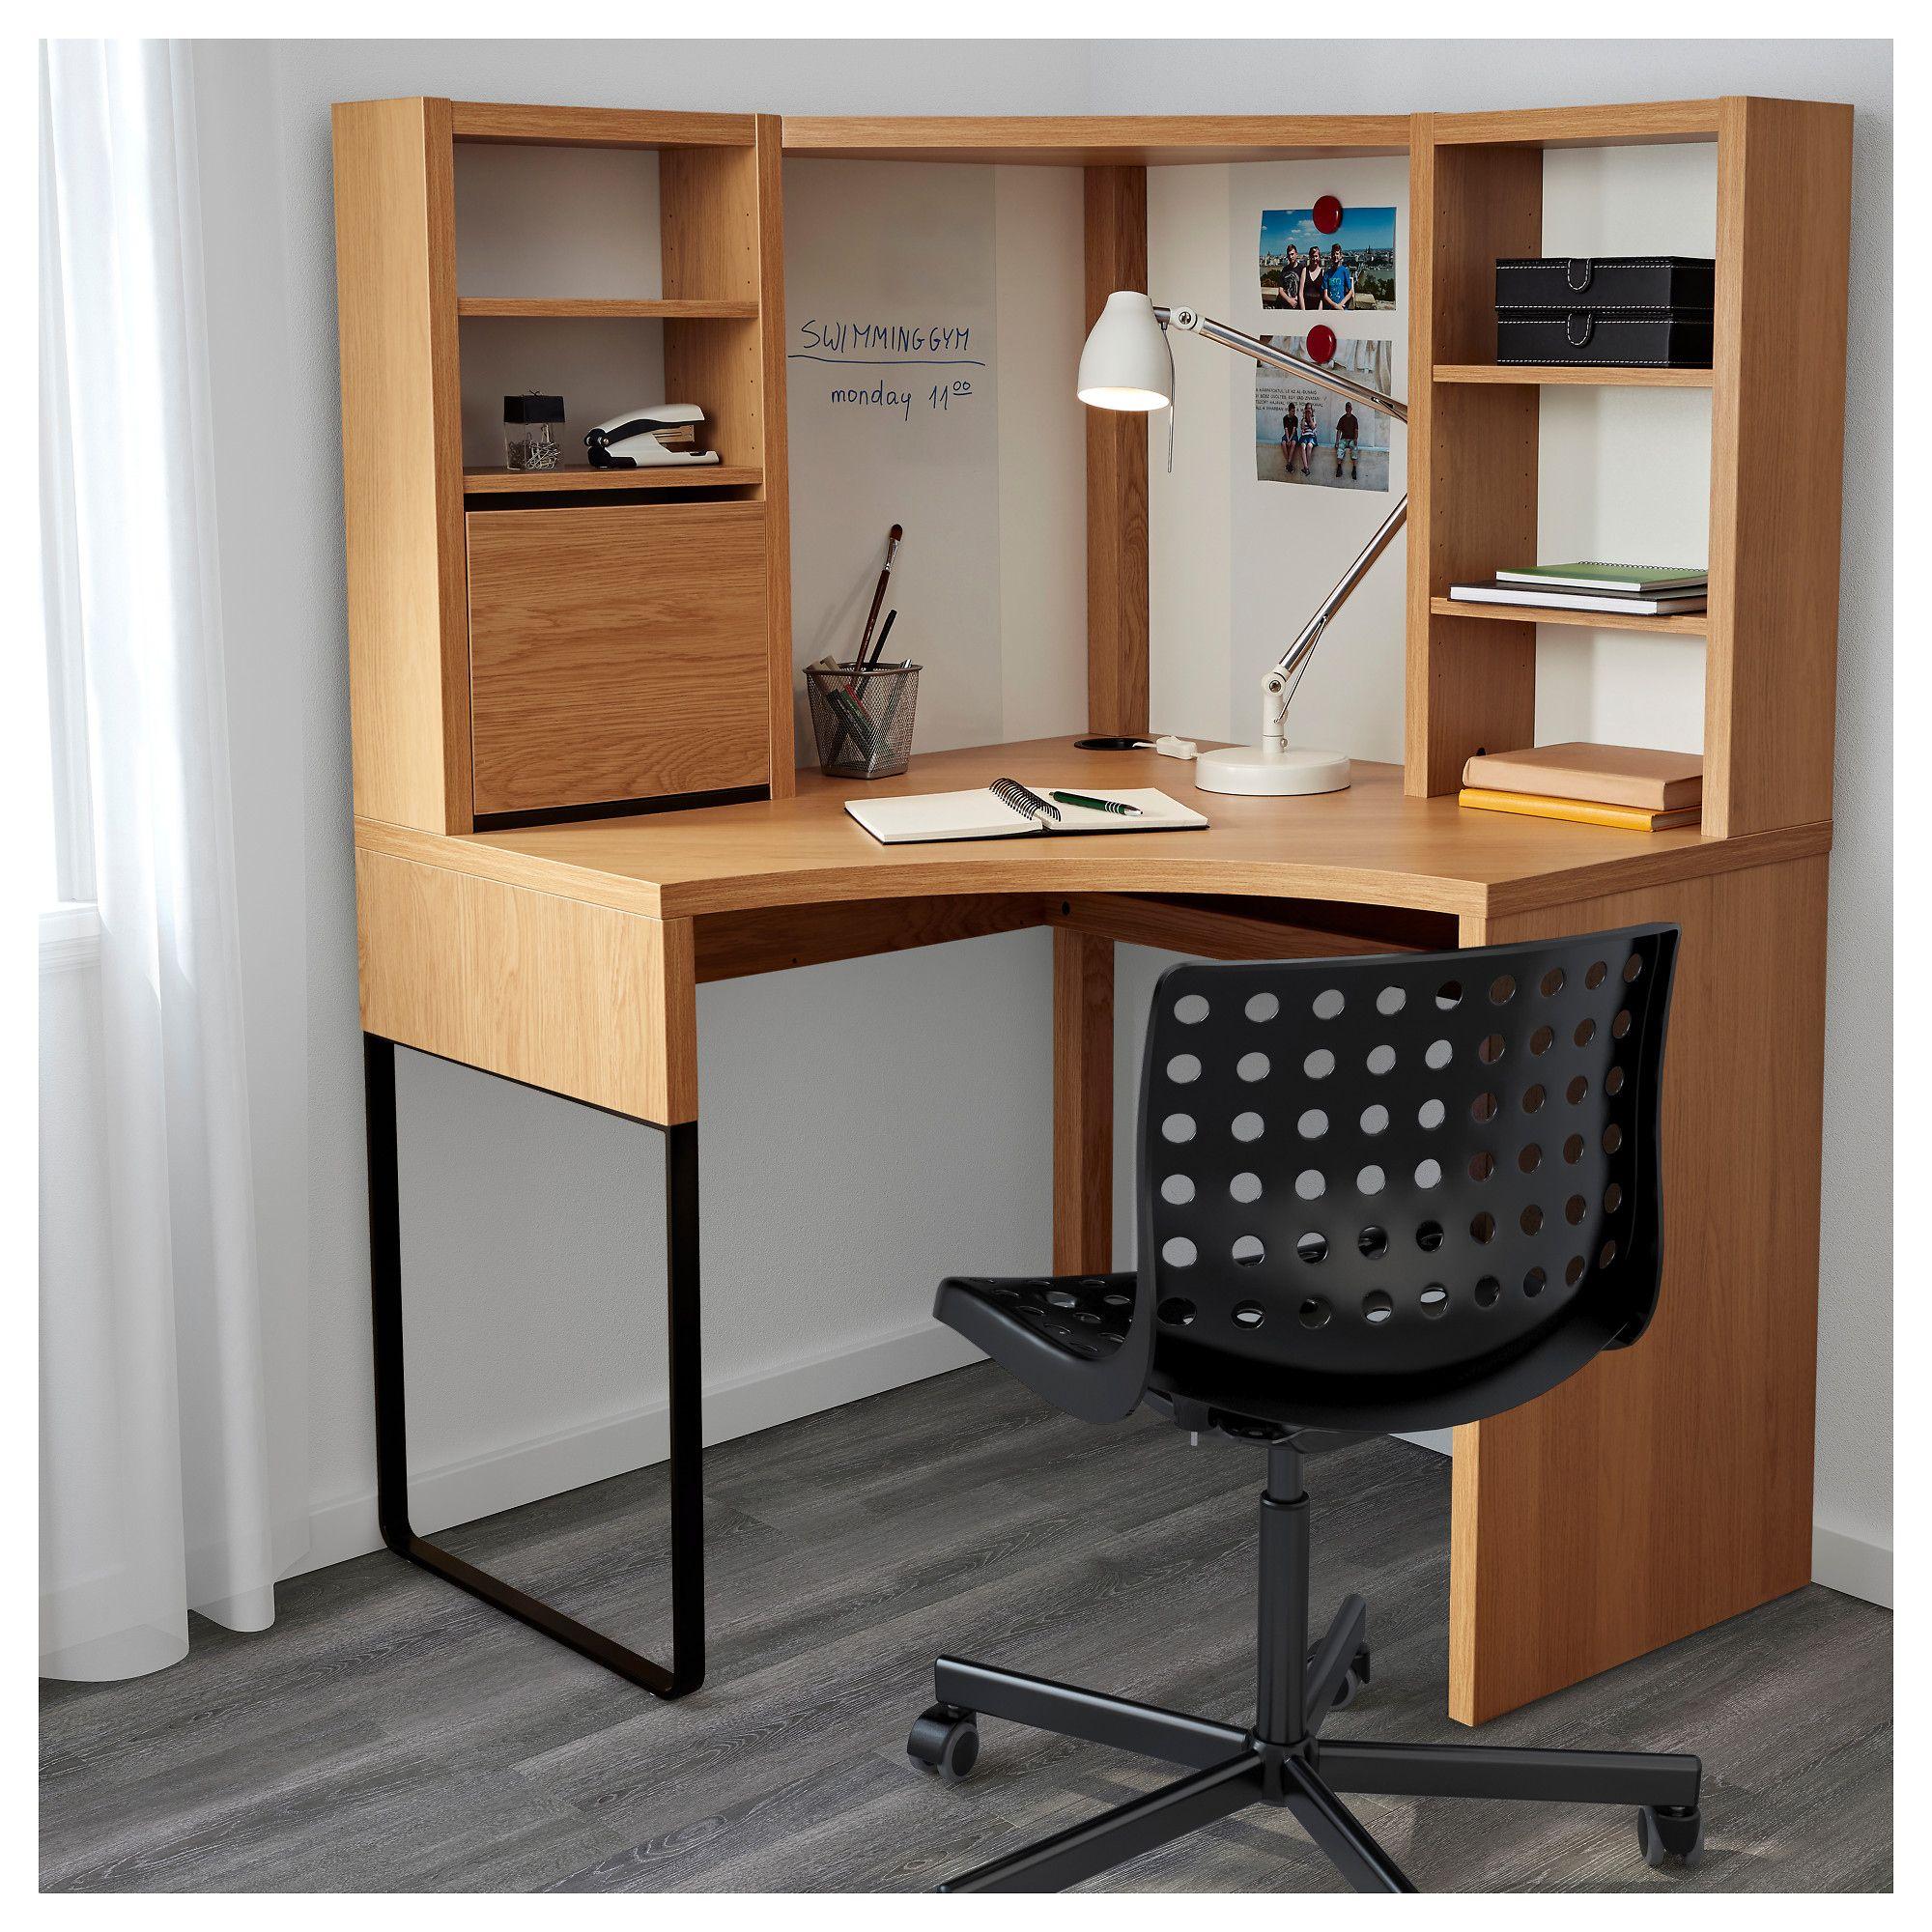 99 Mikael Corner Desk Expensive Home Office Furniture Check More At Http Www Sewcraft Muebles De Esquina Muebles Para Computadora Diseno Muebles De Cocina